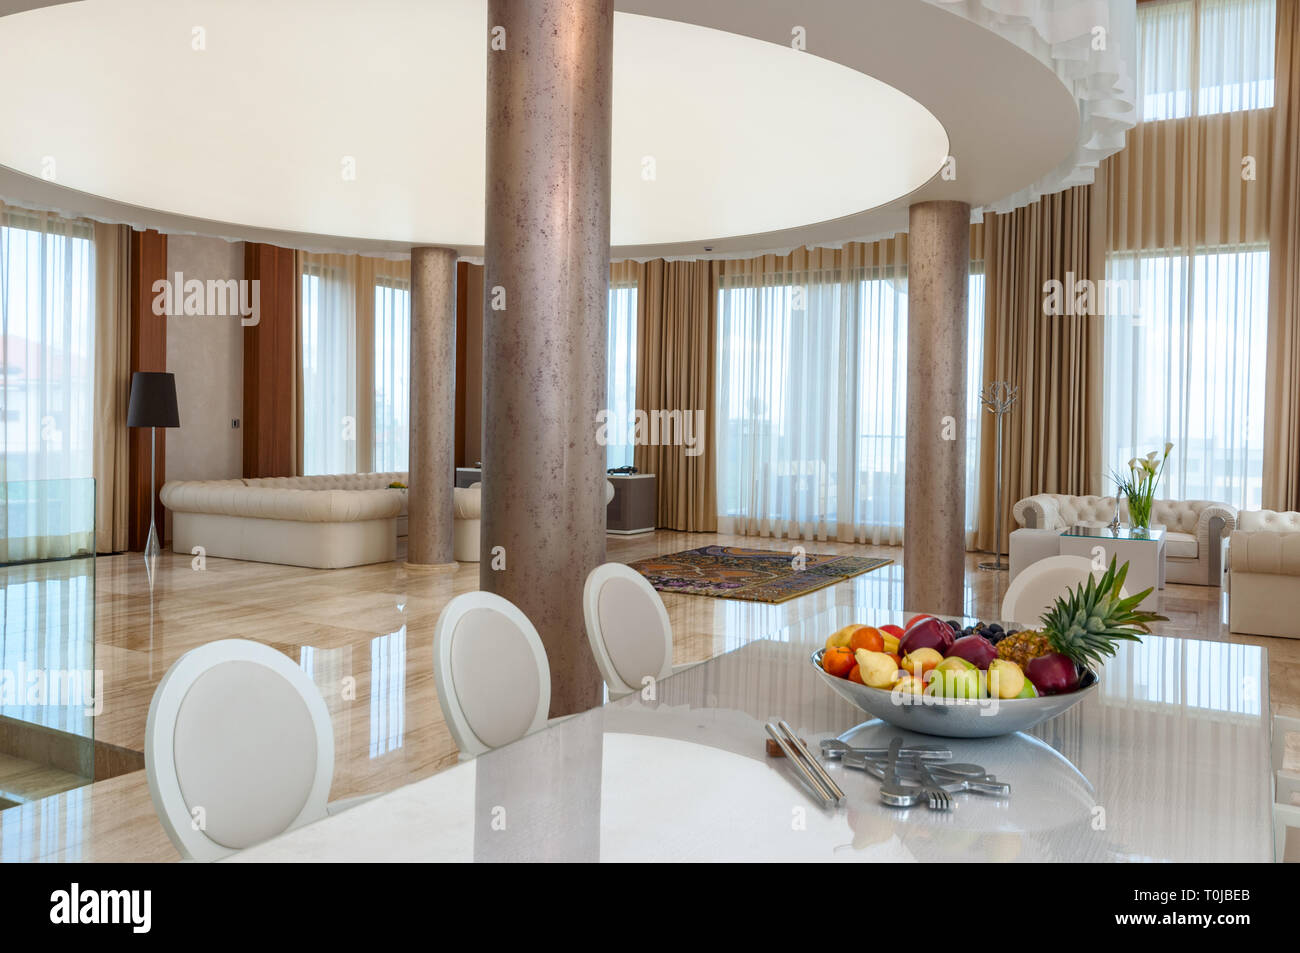 maison de luxe interieur salon burnsocial